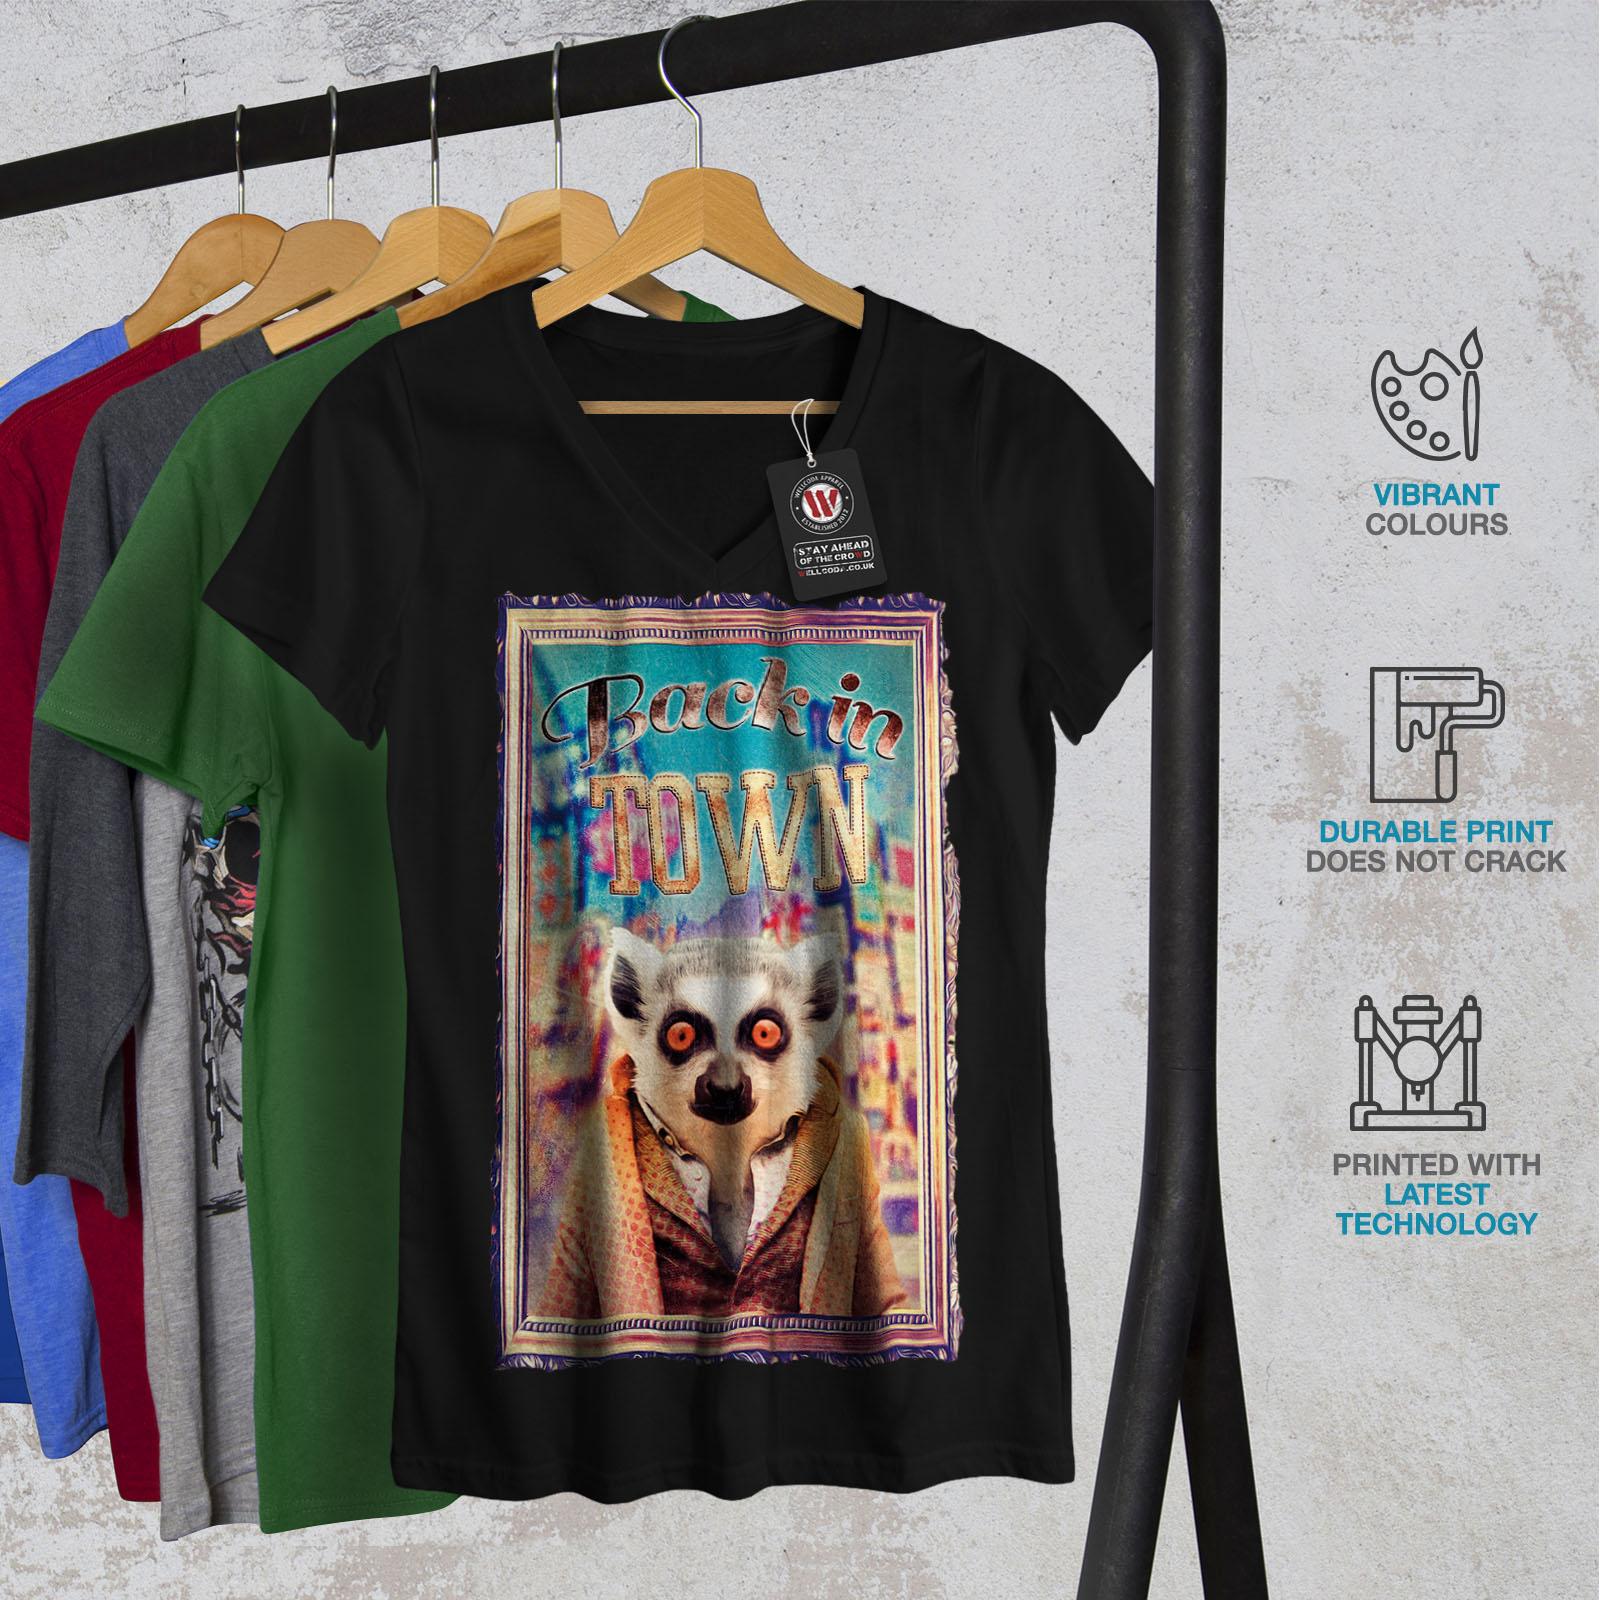 Wellcoda-Back-In-Town-Joke-Womens-V-Neck-T-shirt-Monkey-Graphic-Design-Tee thumbnail 4